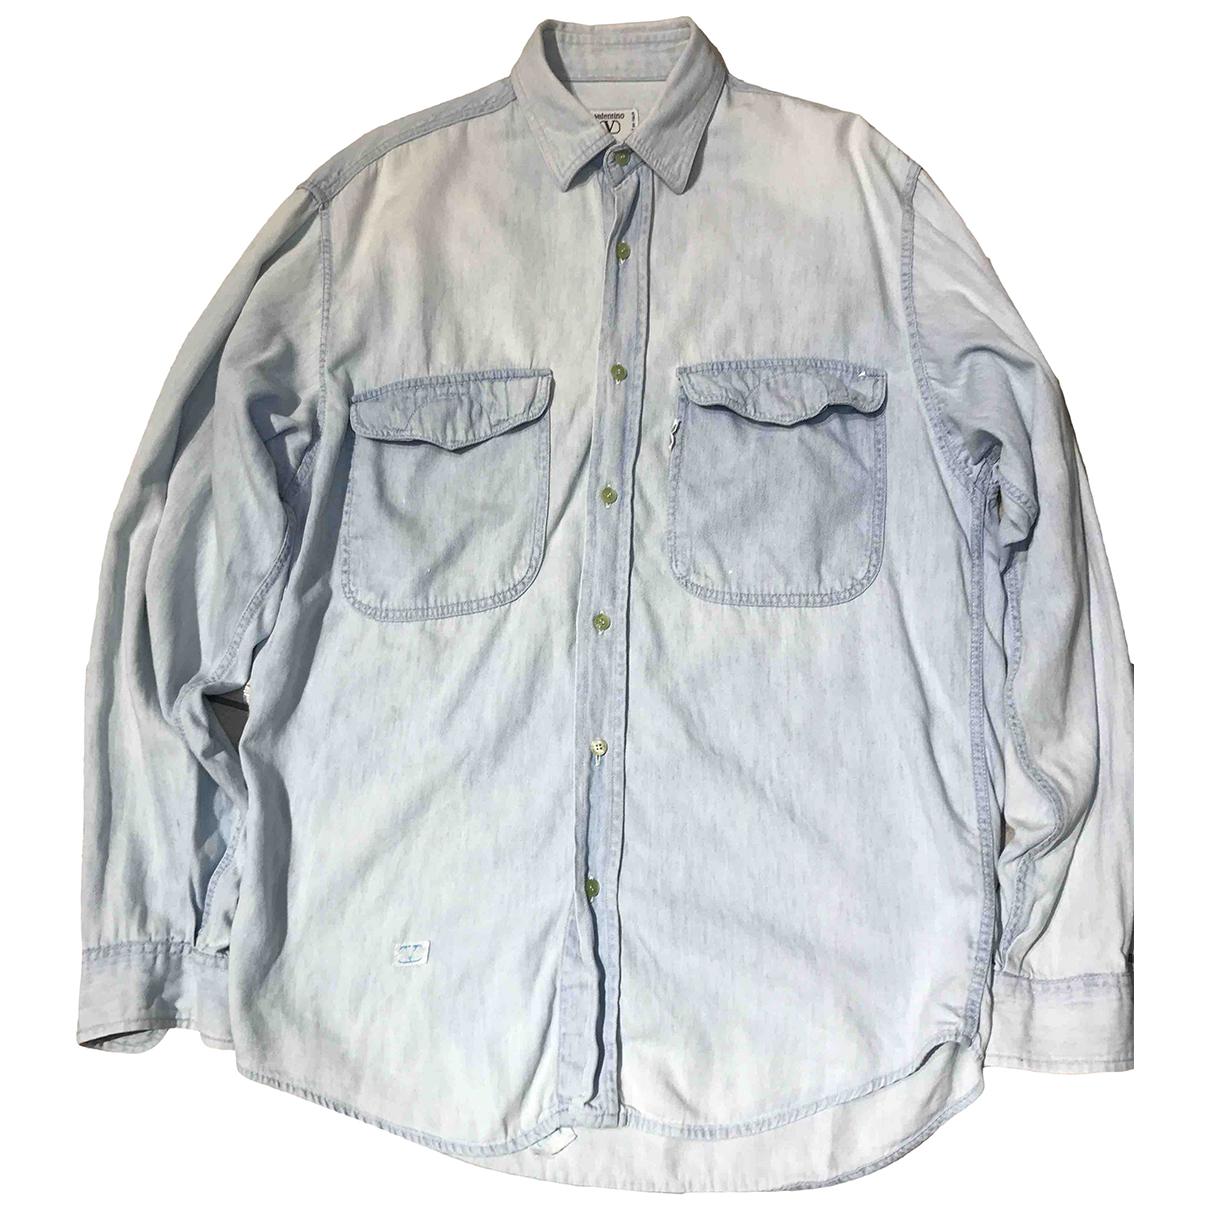 Valentino Garavani N Denim - Jeans Shirts for Men L International